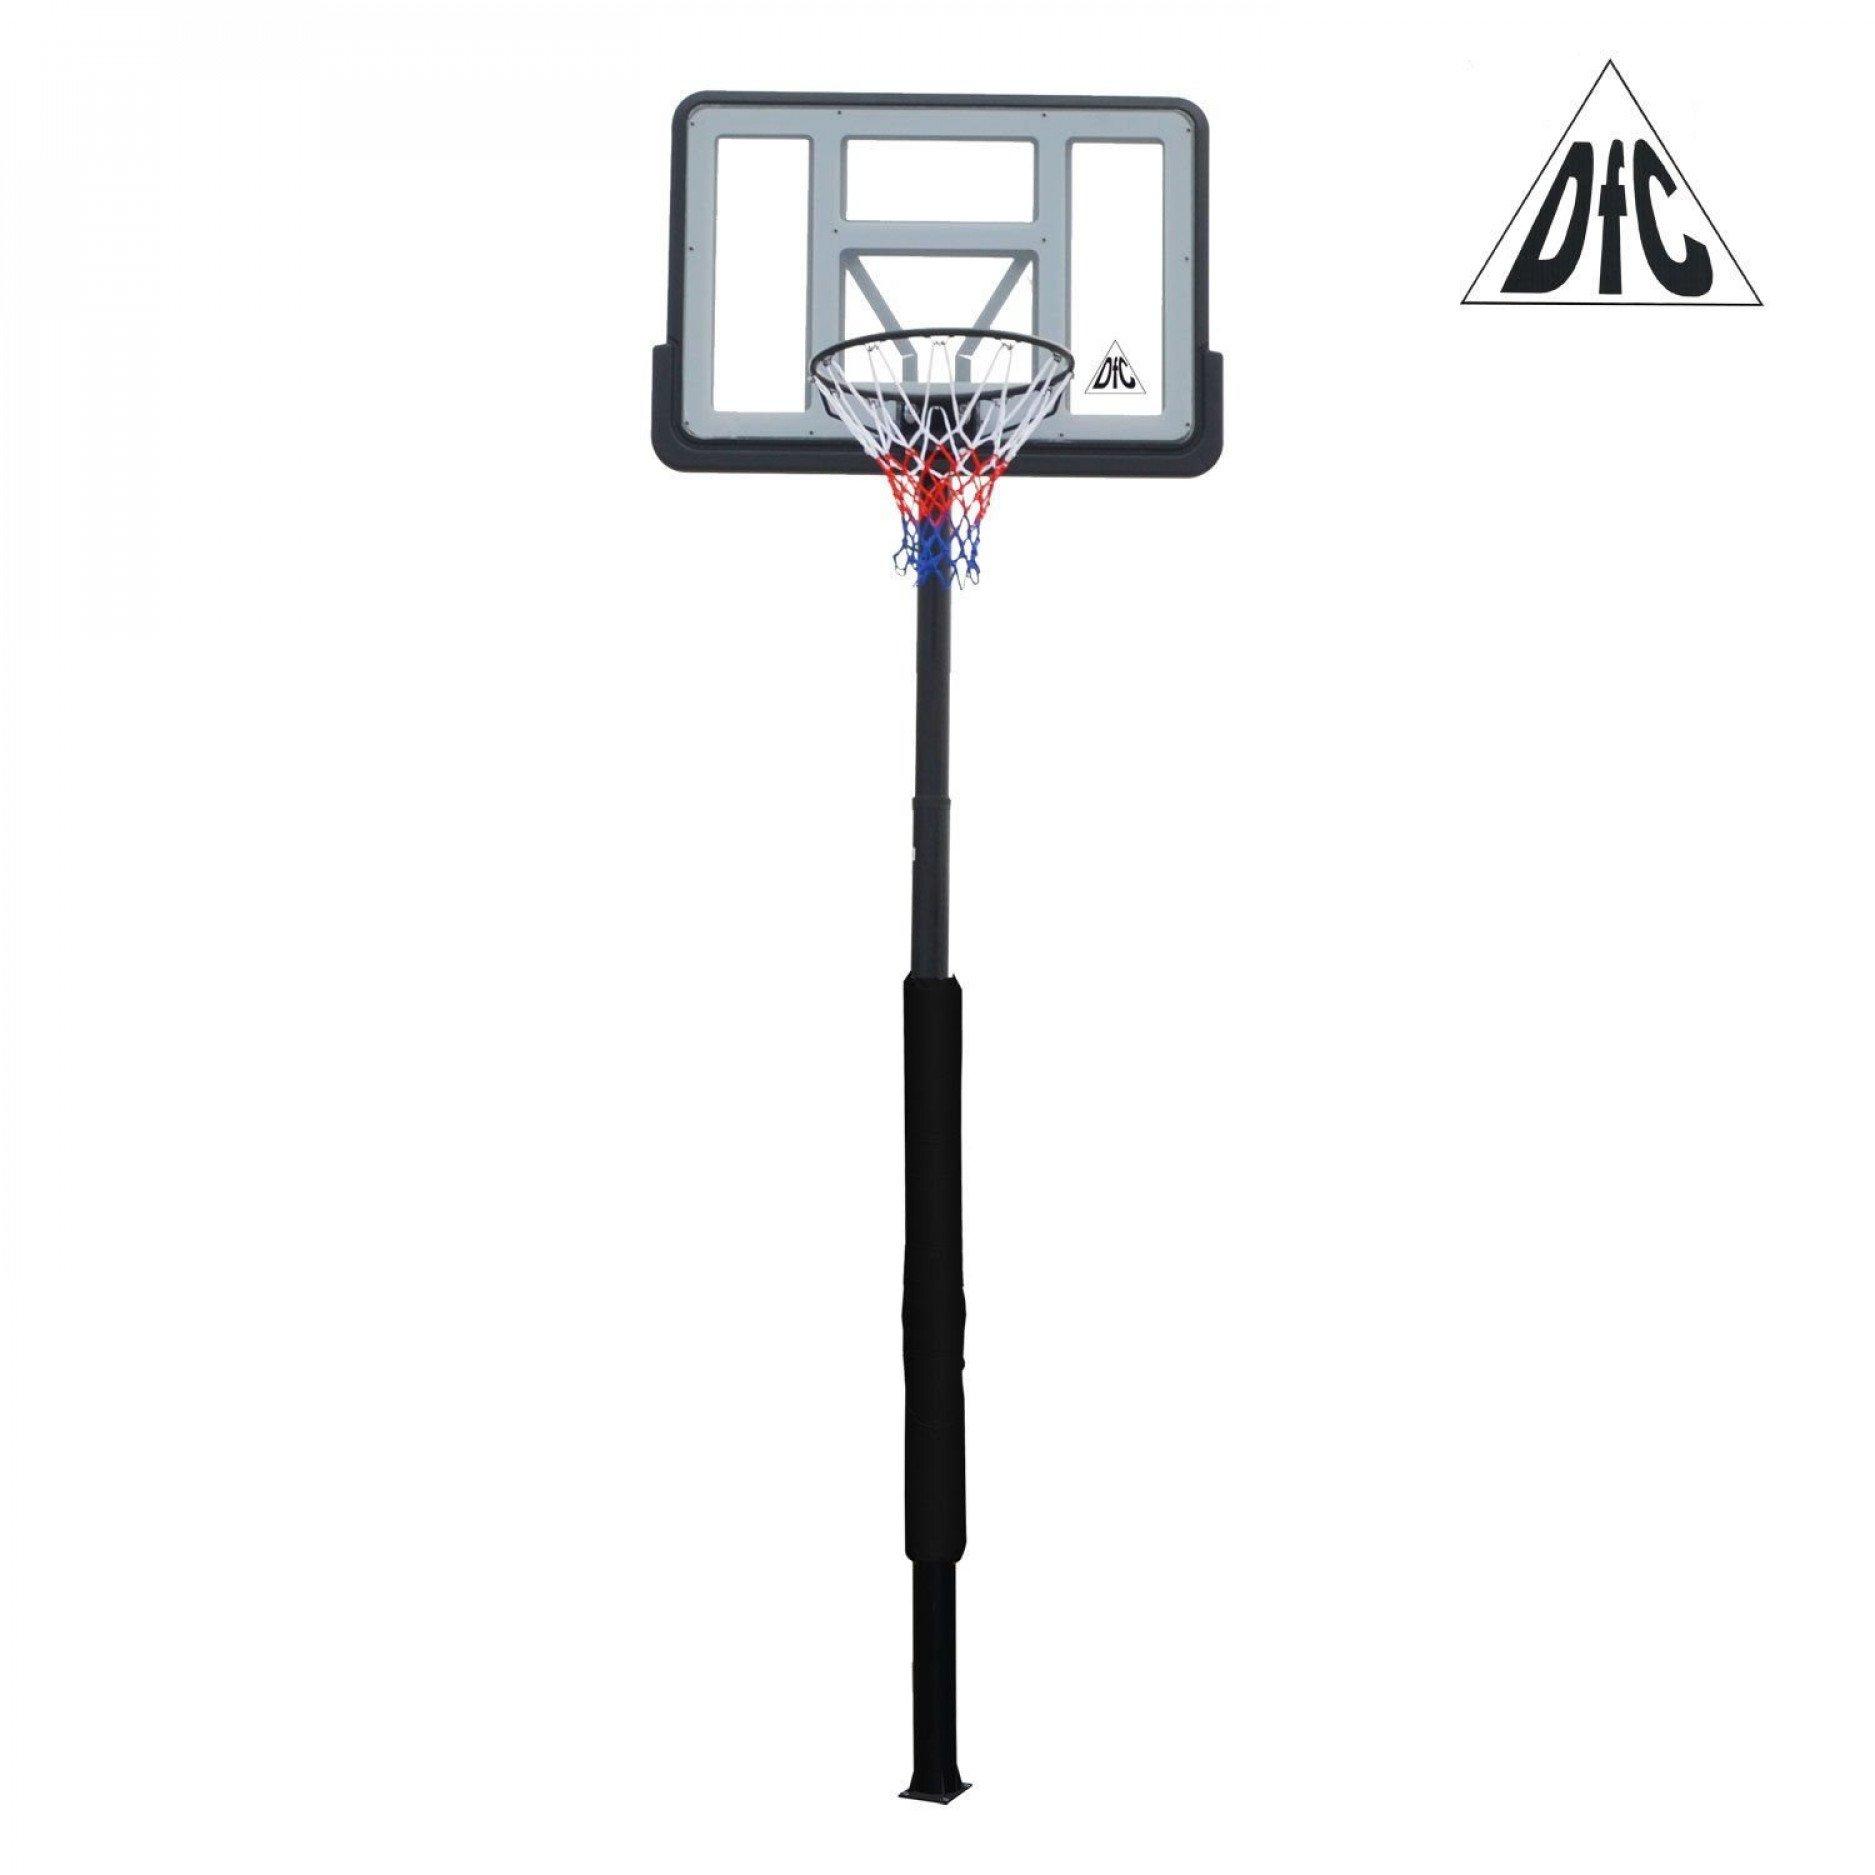 "Стационарная баскетбольная стойка 44"" DFC ING44P1"